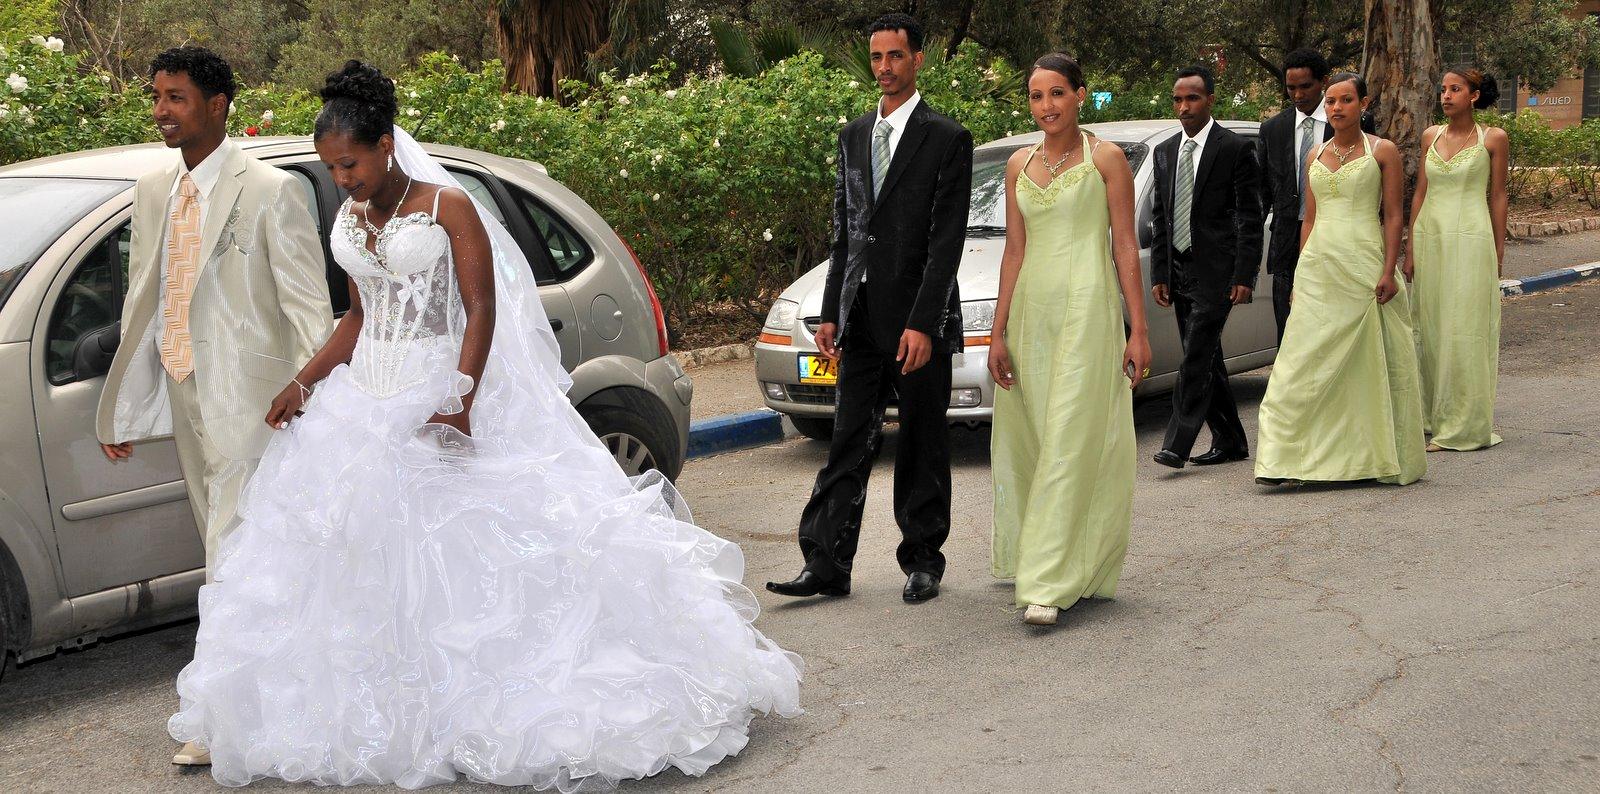 DSC 5790 - Wedding Culture